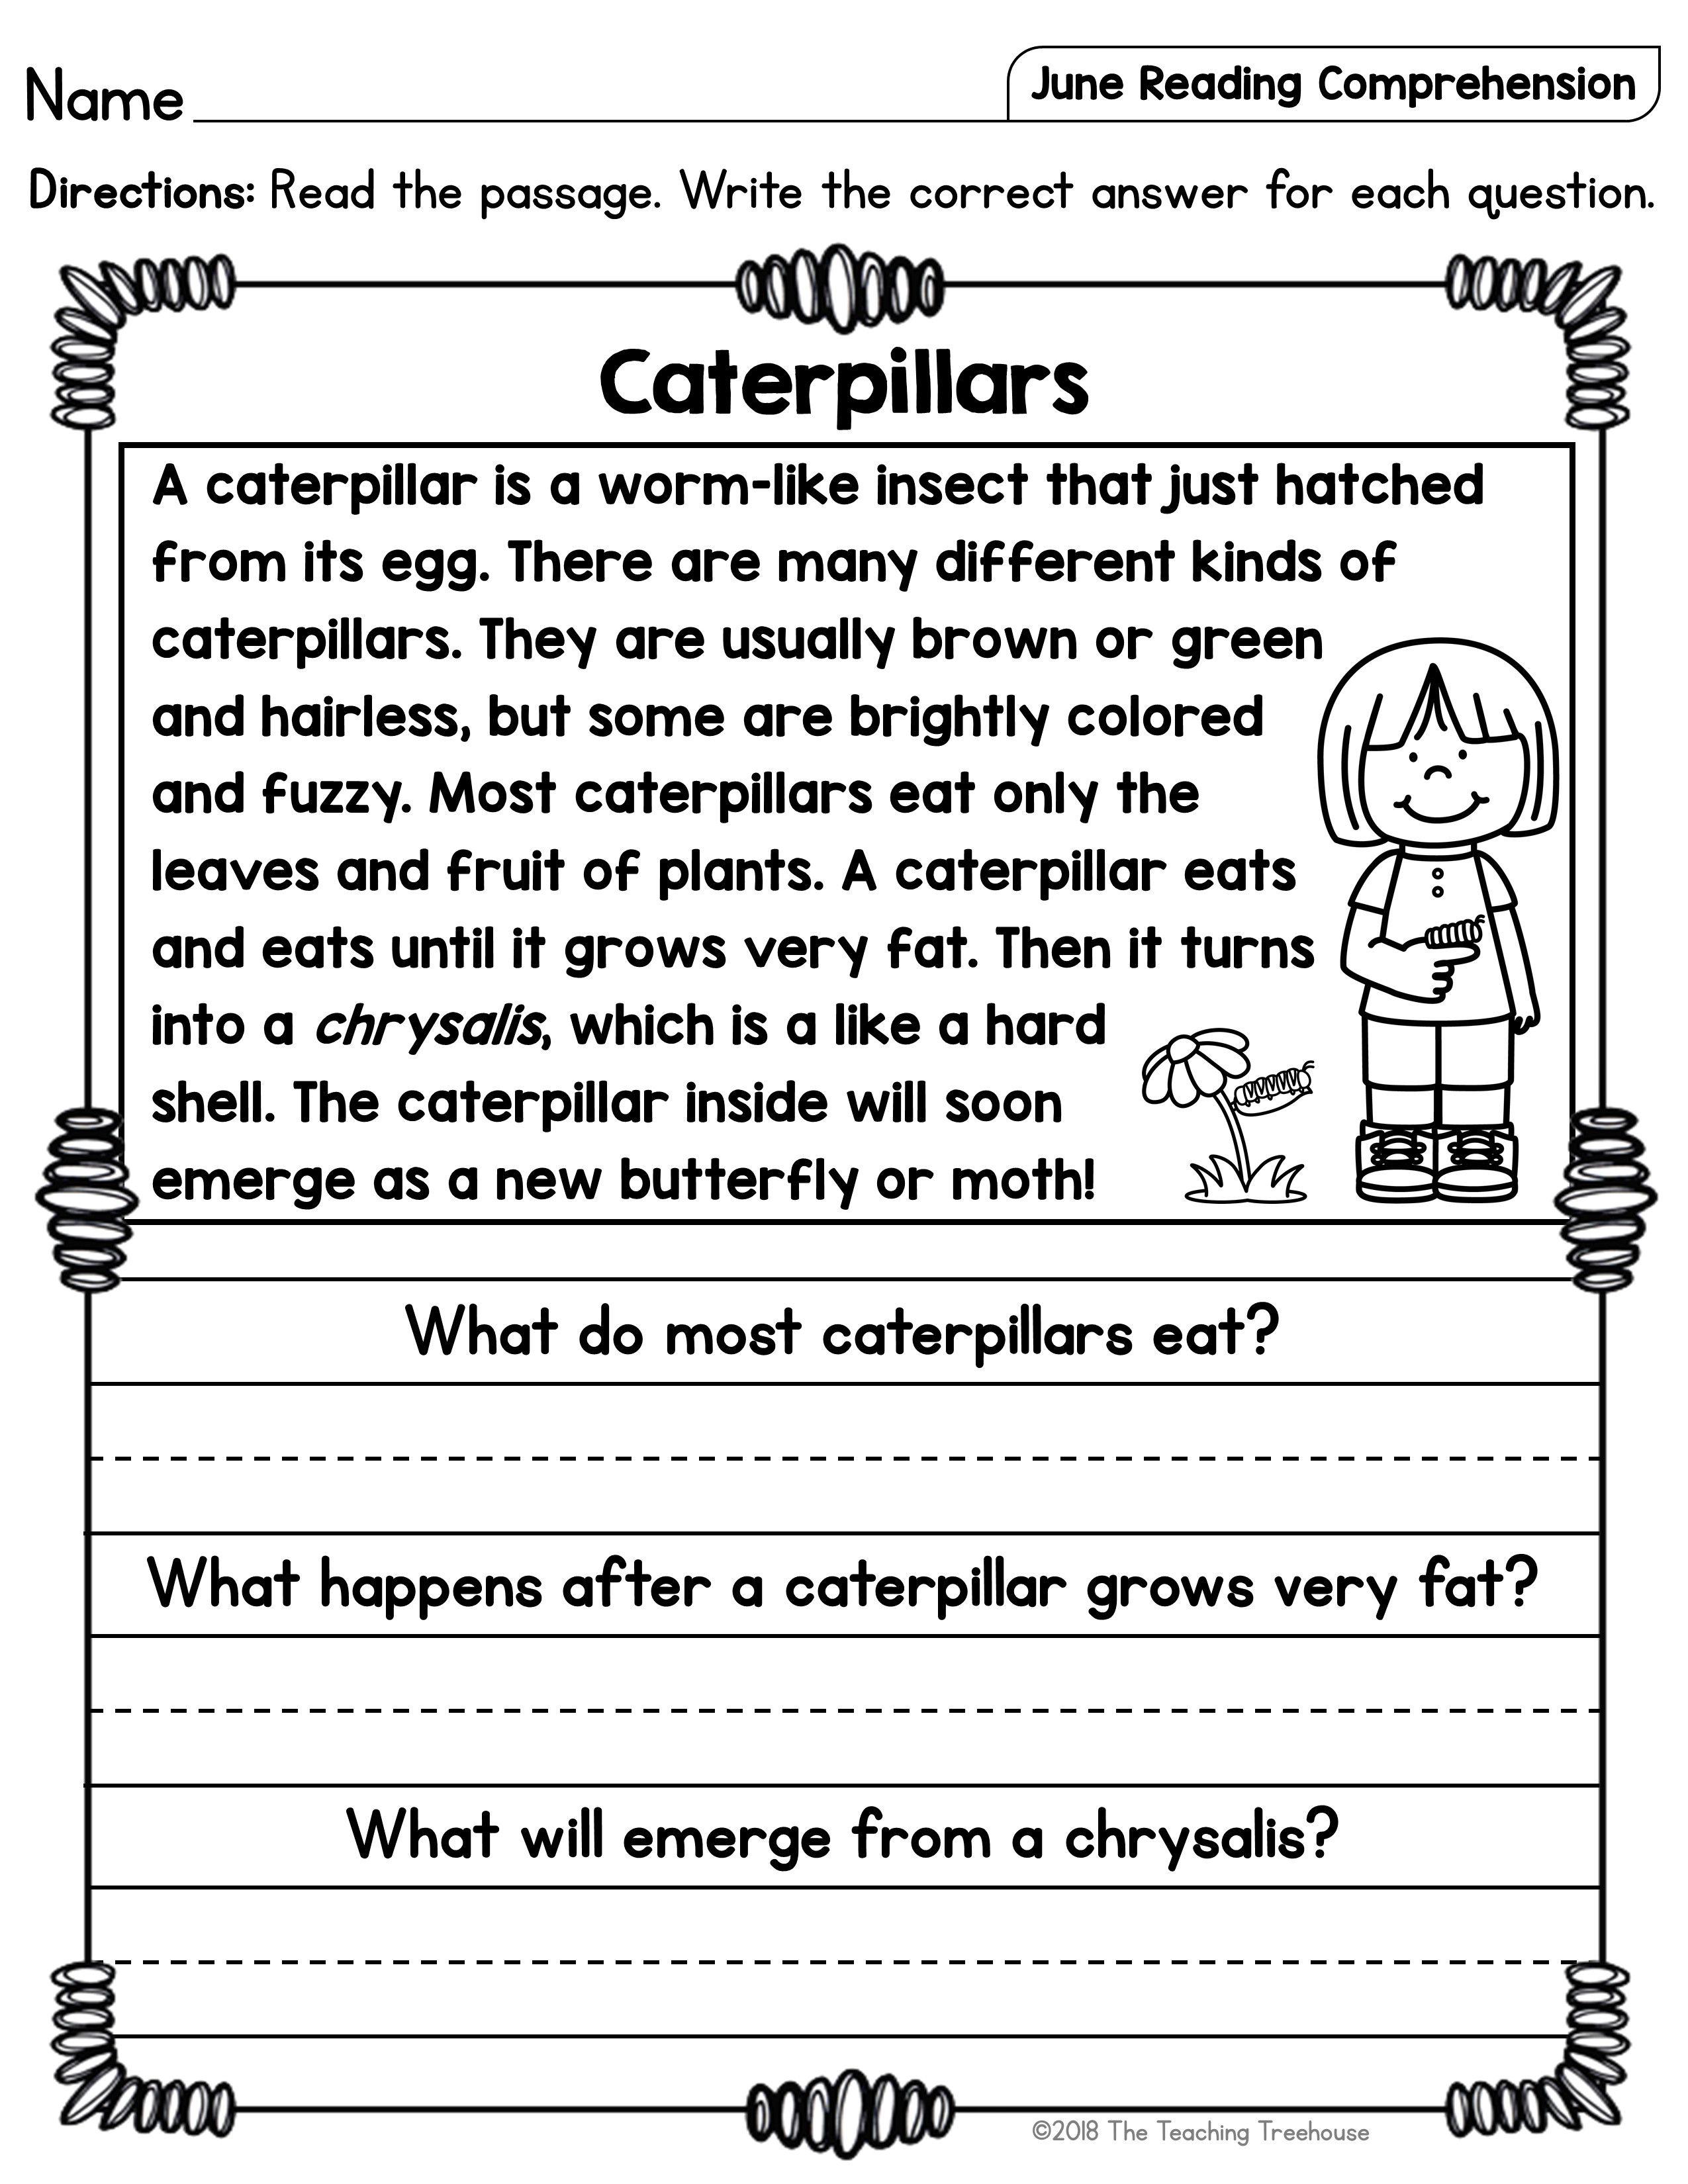 Creative Reading Comprehension Worksheets